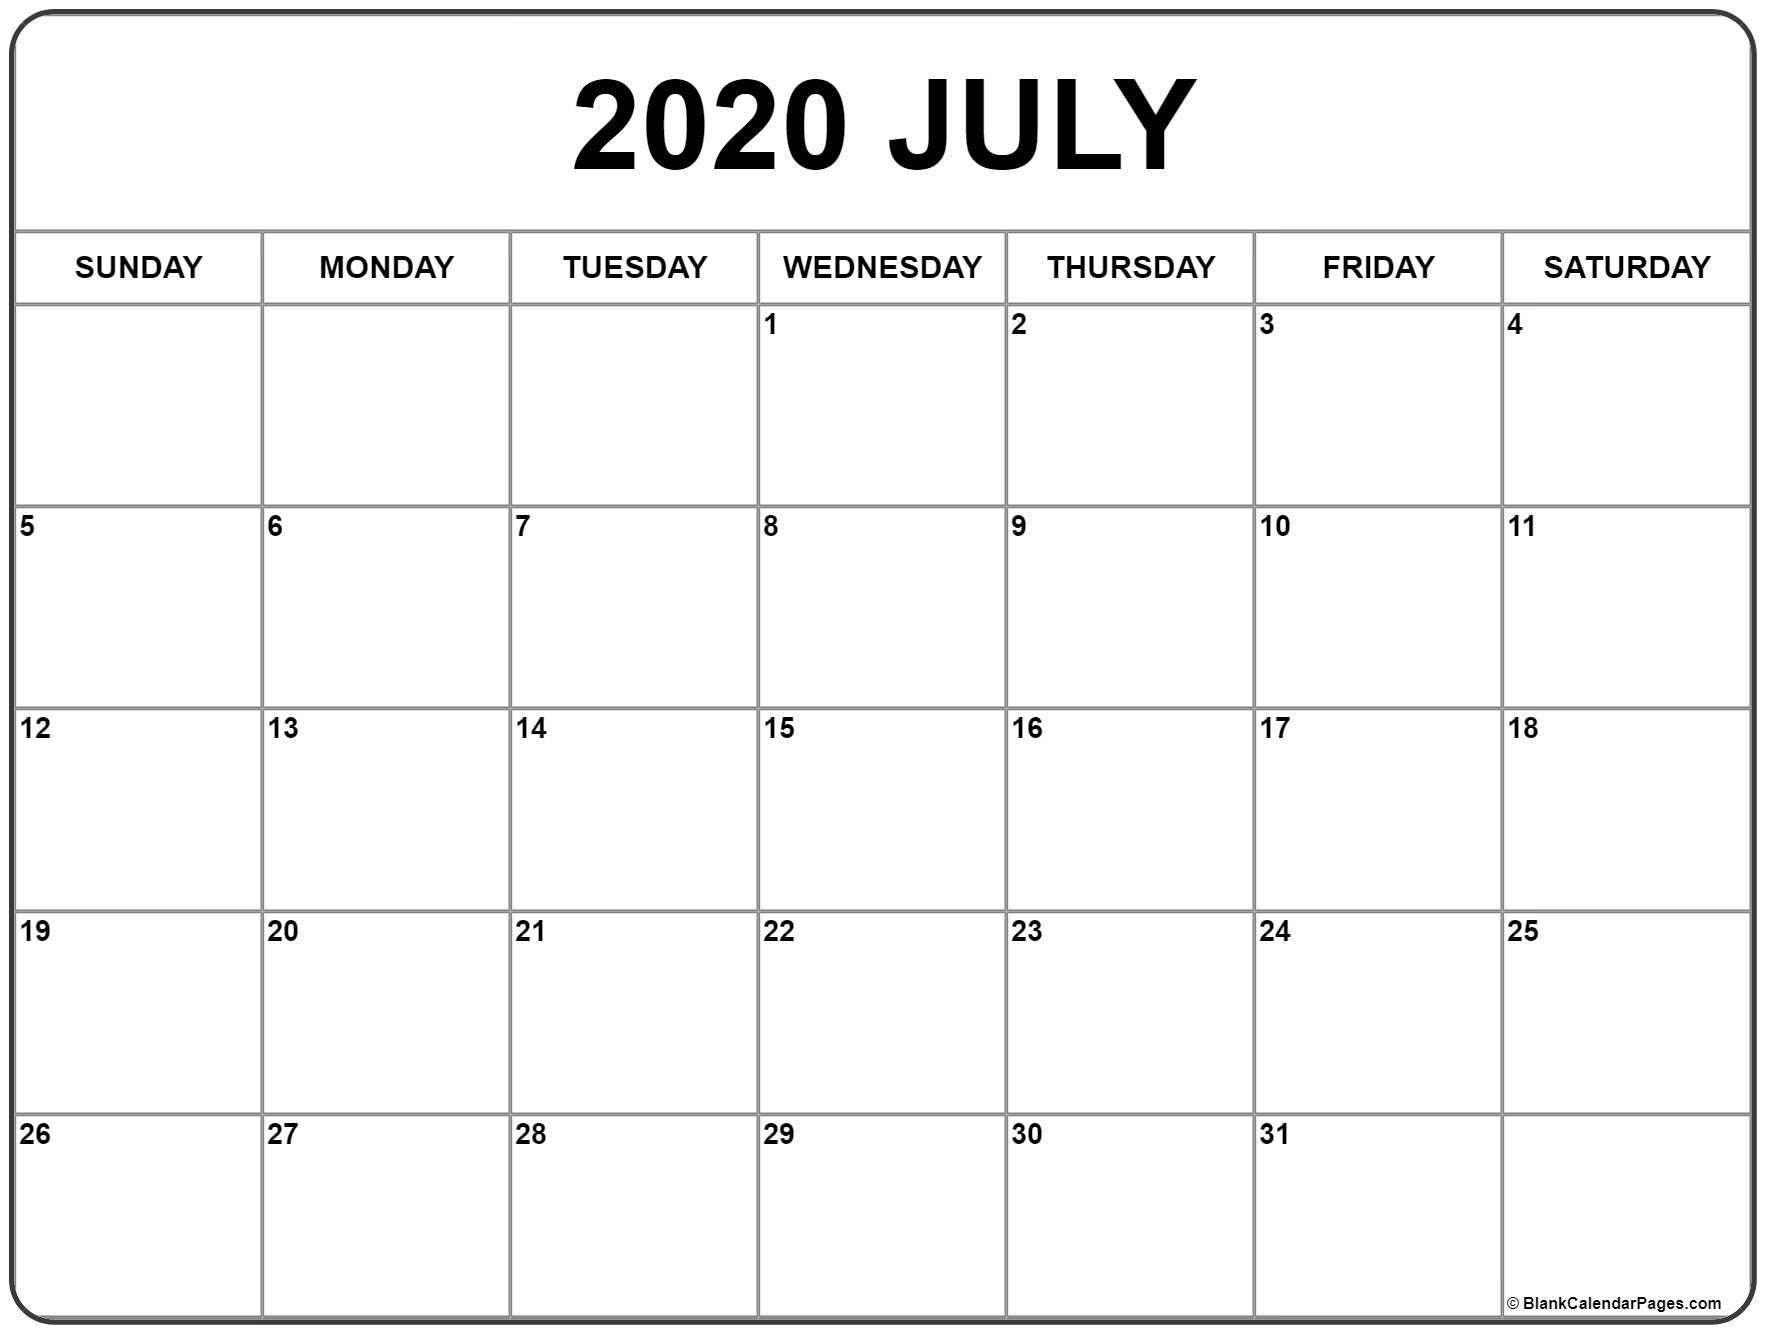 July 2020 Calendar | Free Printable Monthly Calendars